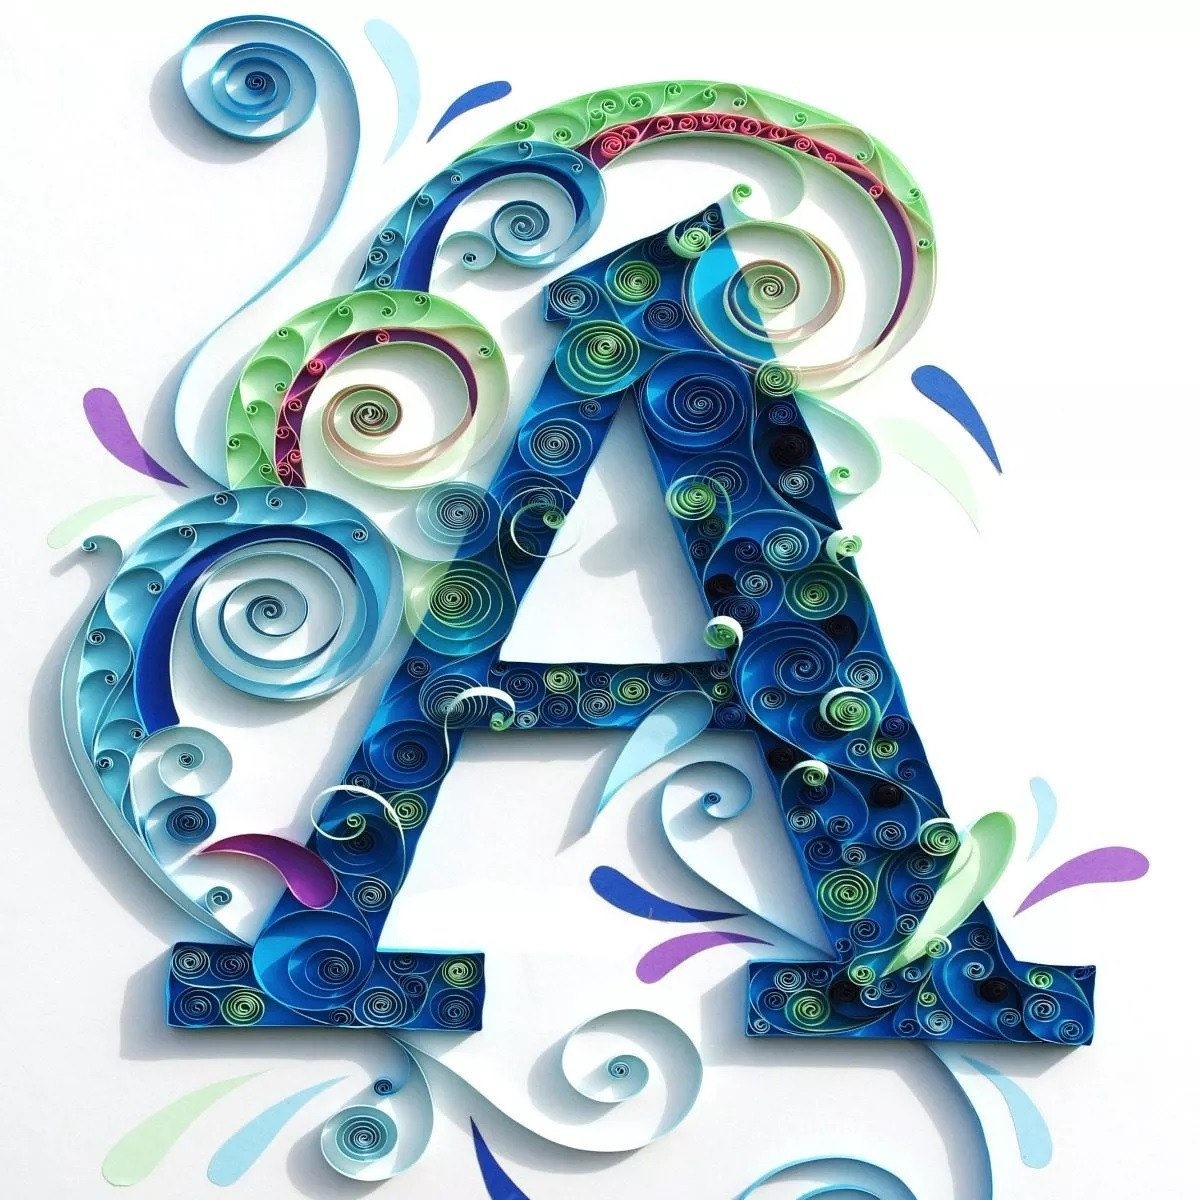 monograma da letra A emq uilling